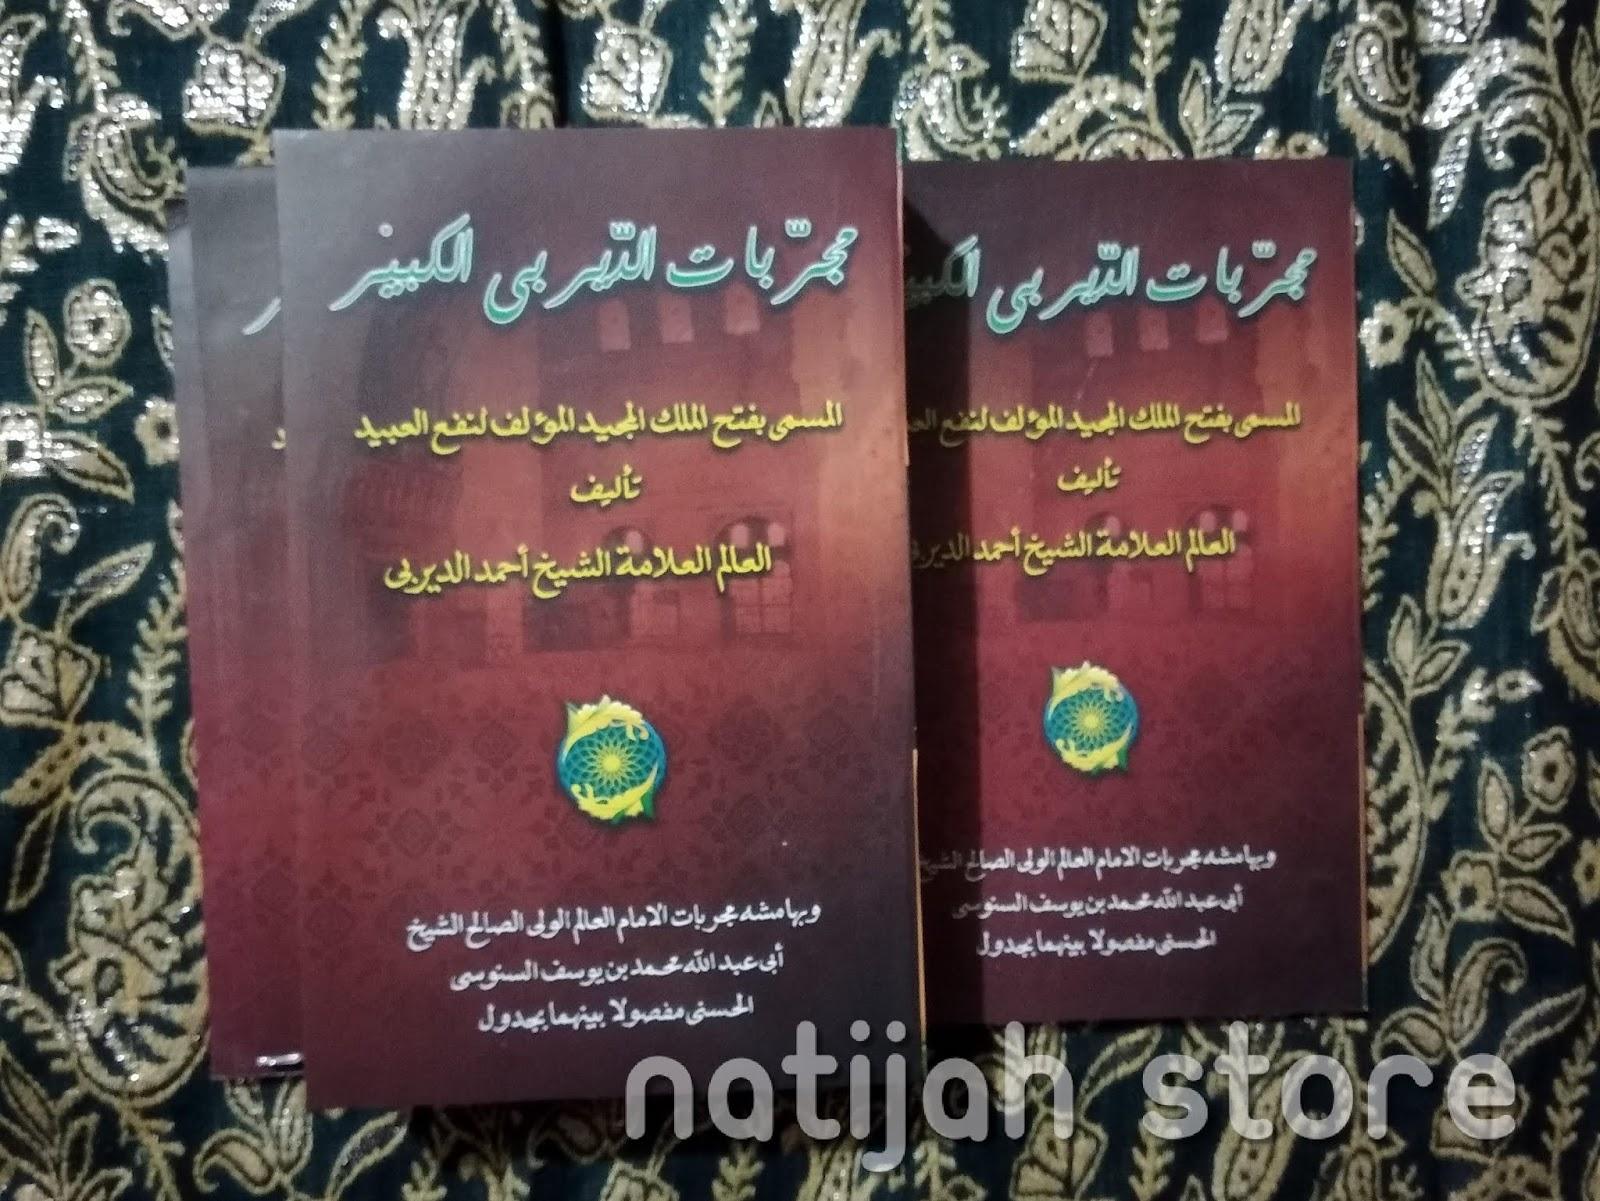 Kitab Mujrarobat Daerobi